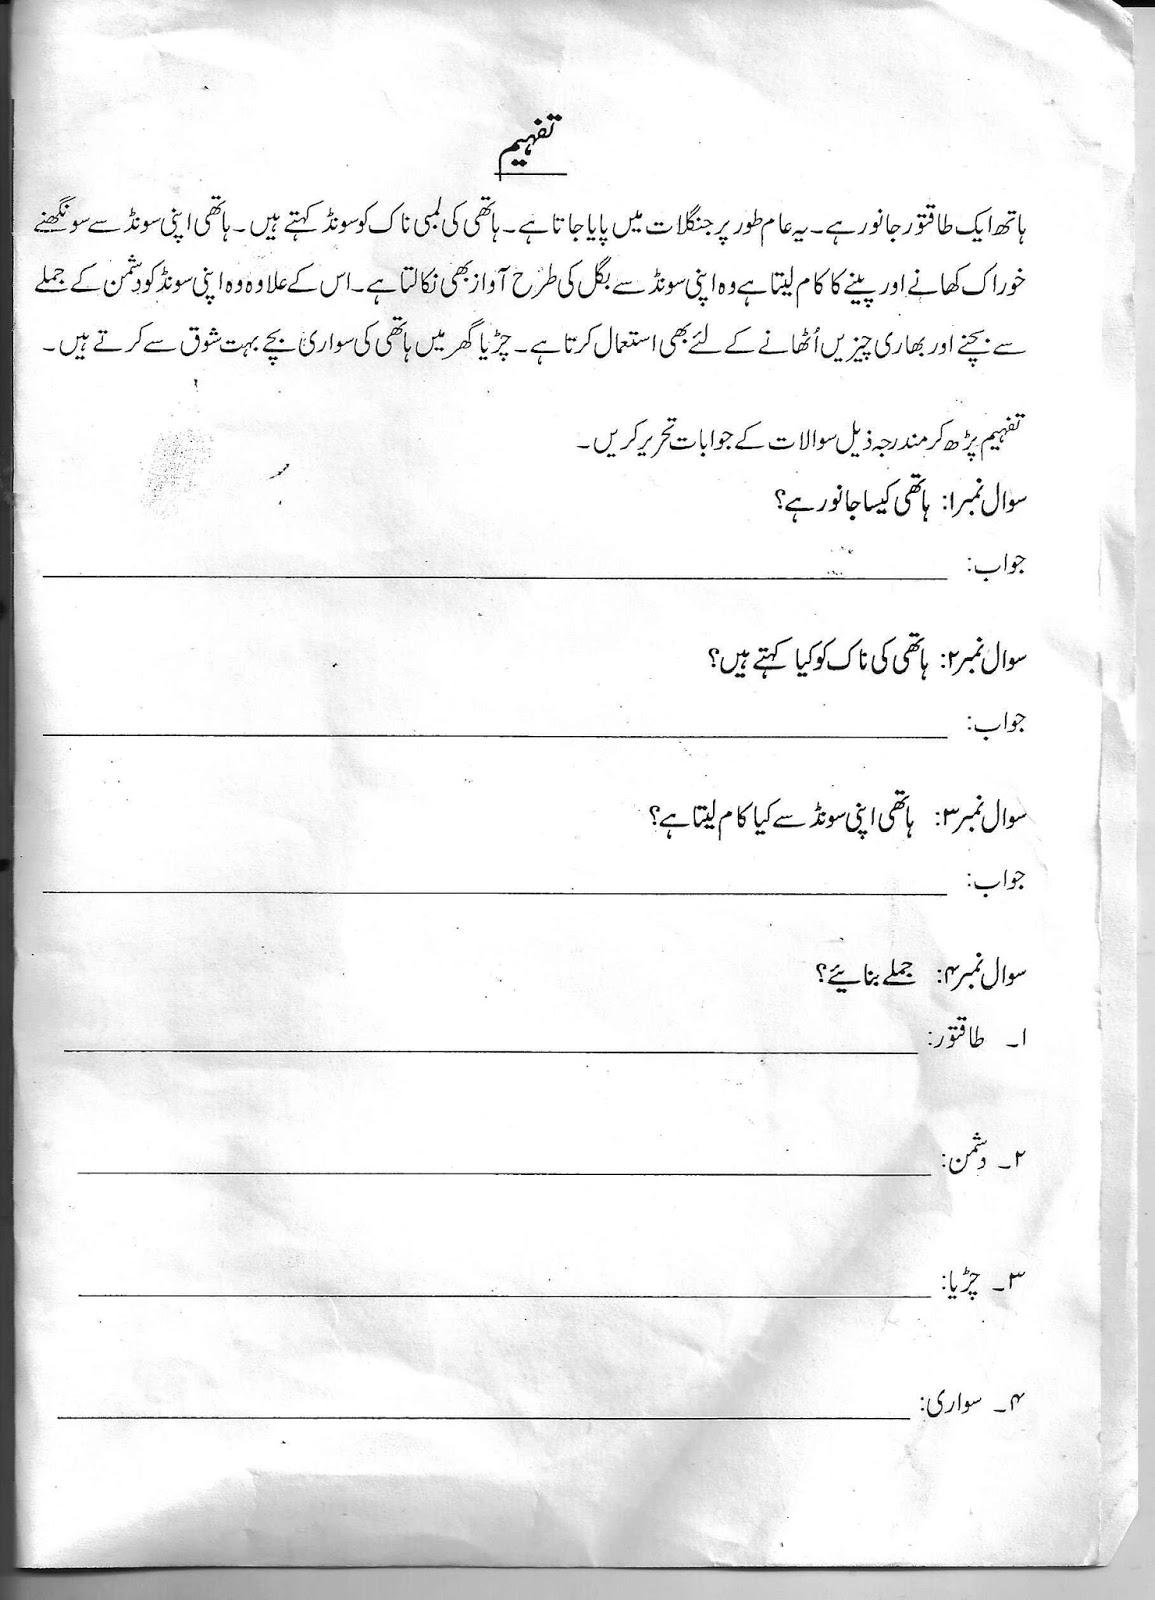 Worksheet For Class 2 Urdu   Printable Worksheets and Activities for  Teachers [ 1600 x 1155 Pixel ]